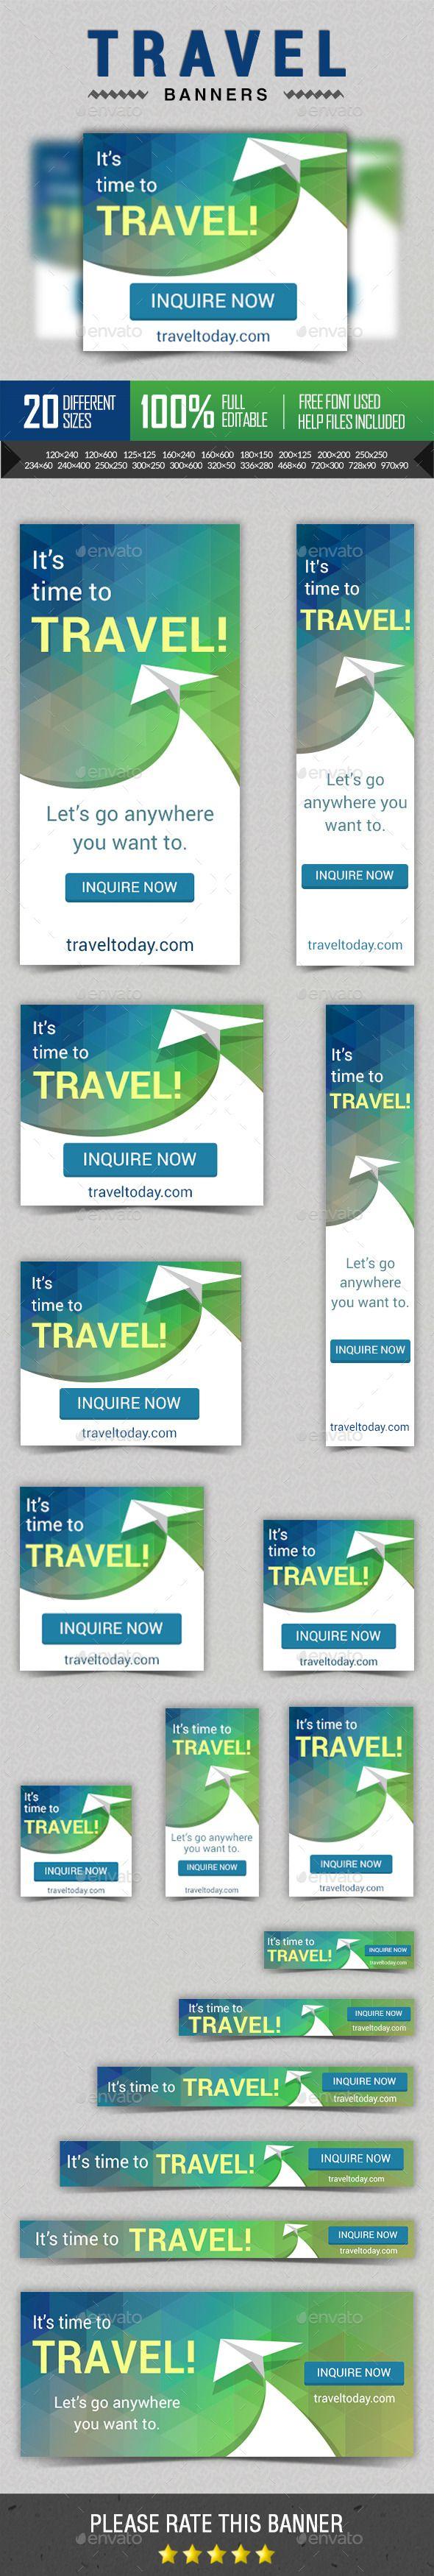 Travel - Vacation Ad Marketing Banners | #travelbannerstemplate #travelwebbanner | Download: http://graphicriver.net/item/travel-vacation-ad-marketing-banners/10299686?ref=ksioks